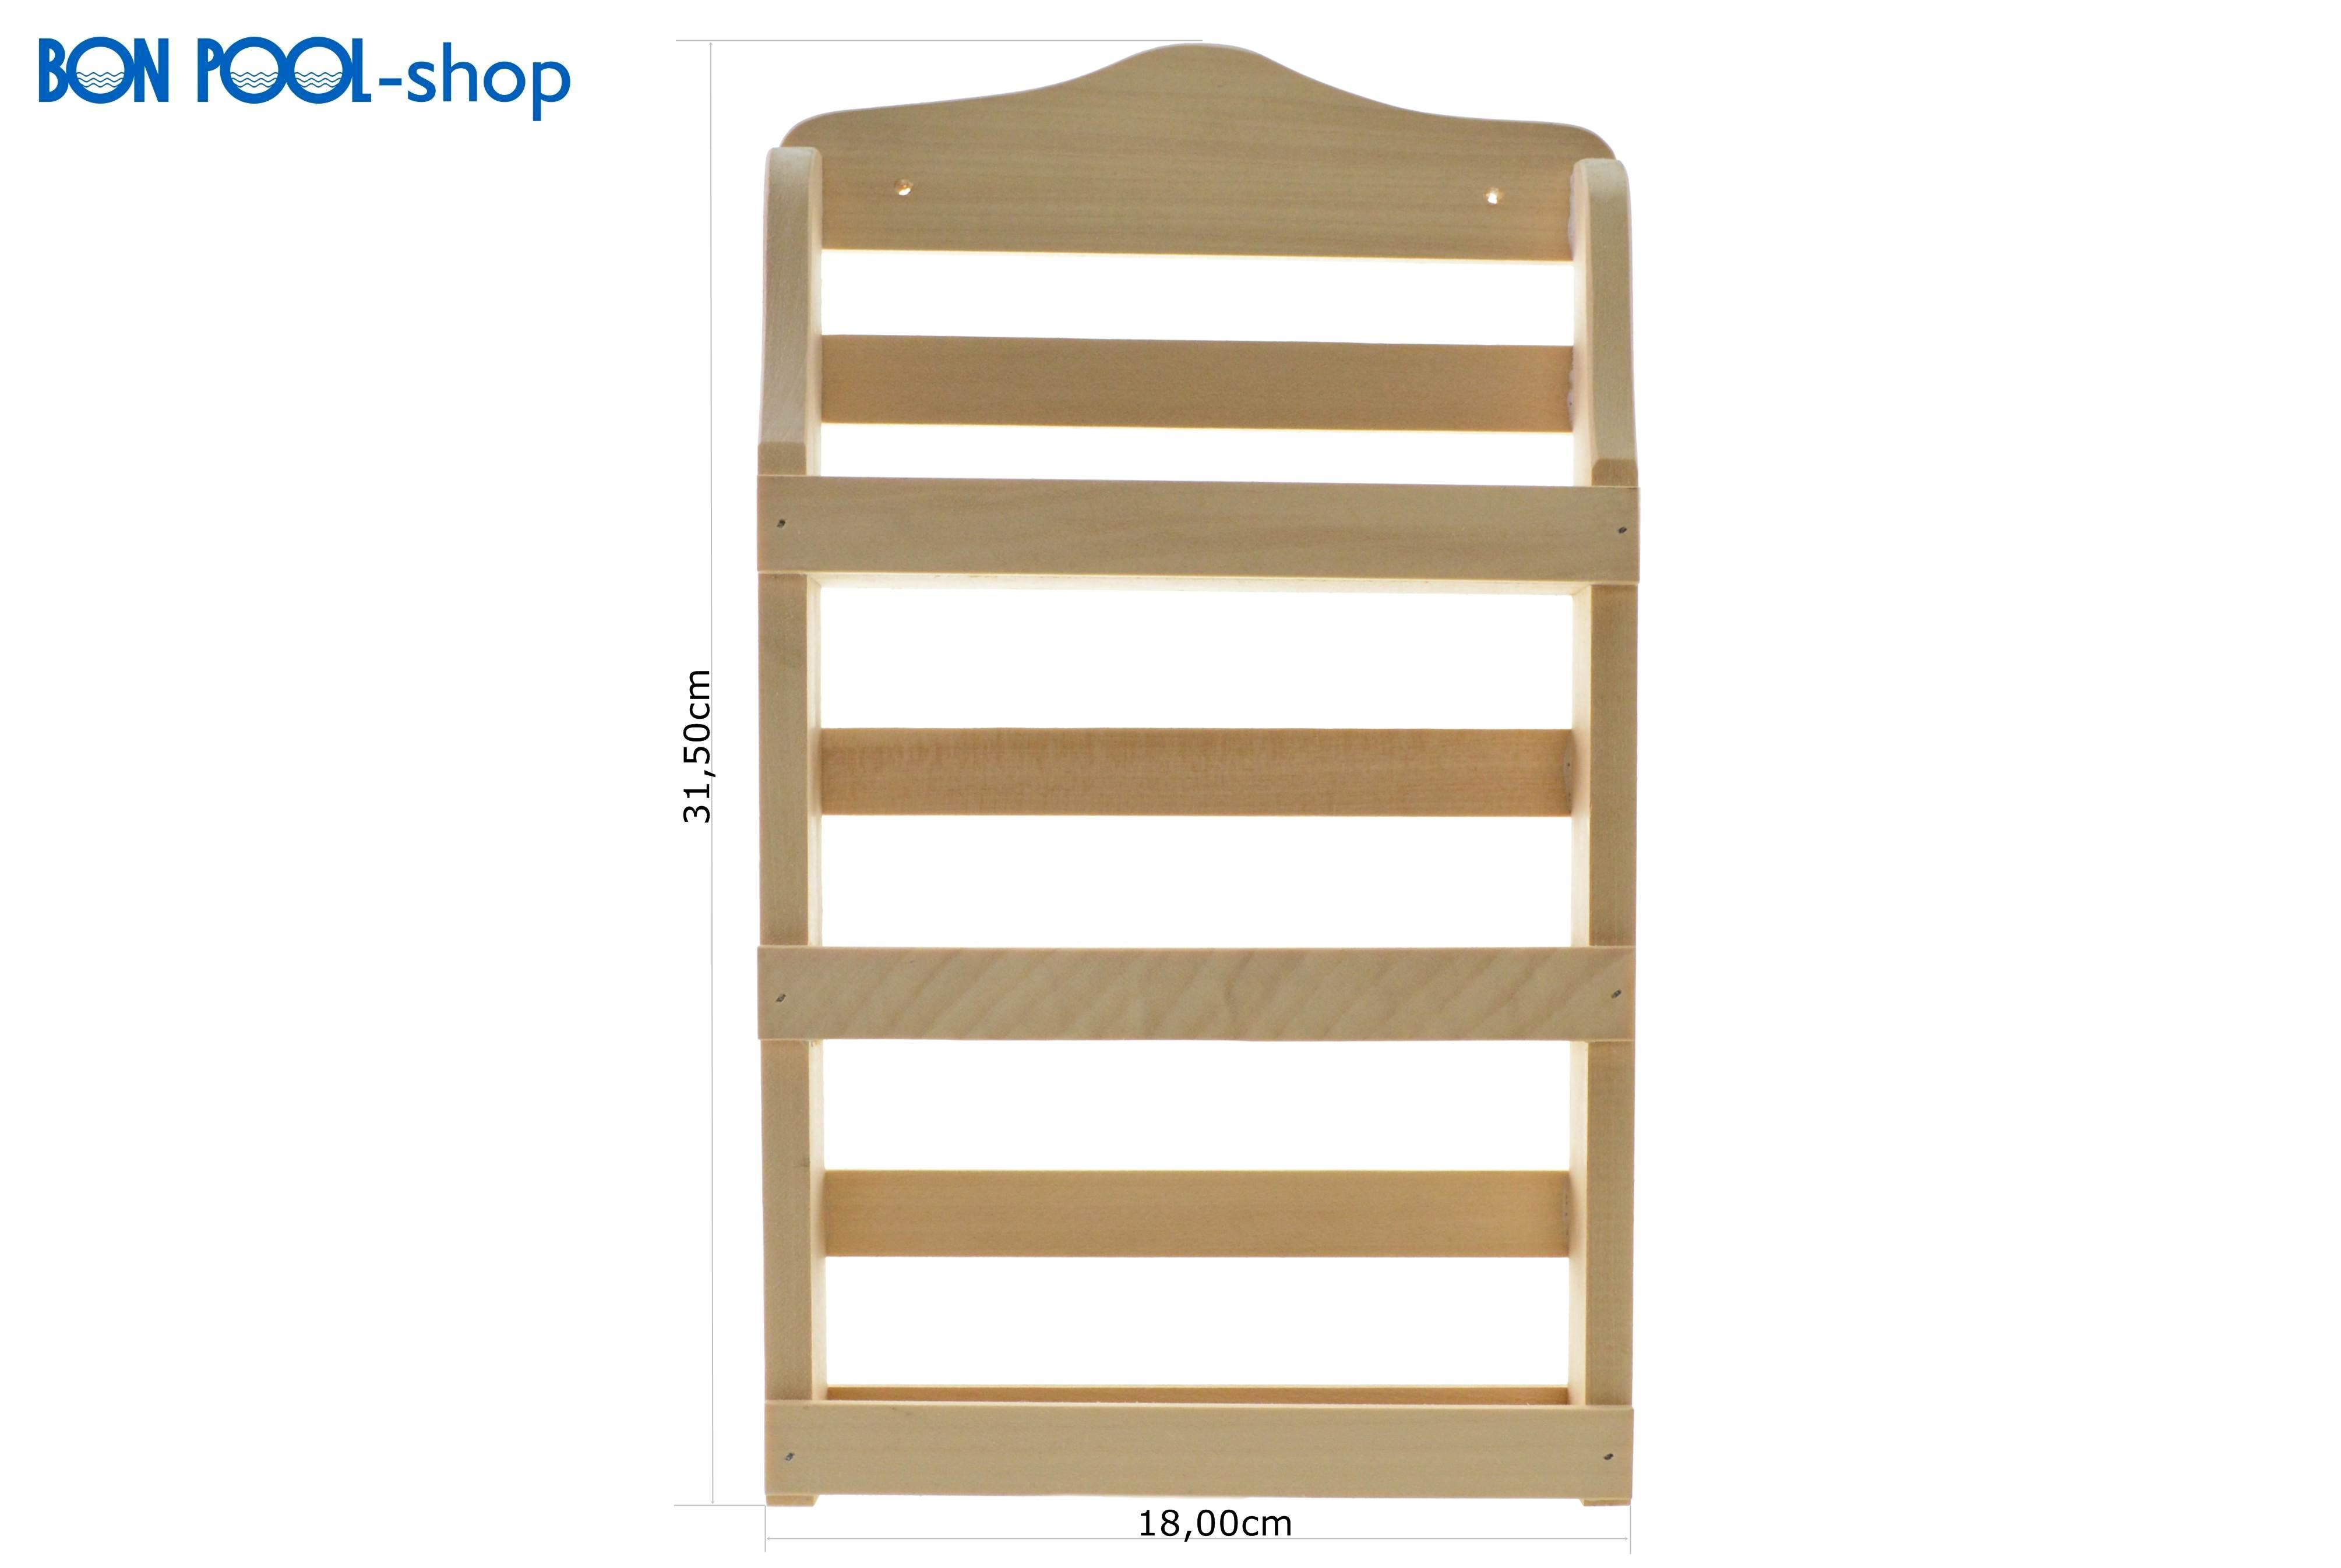 saunaduft ablage 3 f cher wandregal sauna bon pool. Black Bedroom Furniture Sets. Home Design Ideas